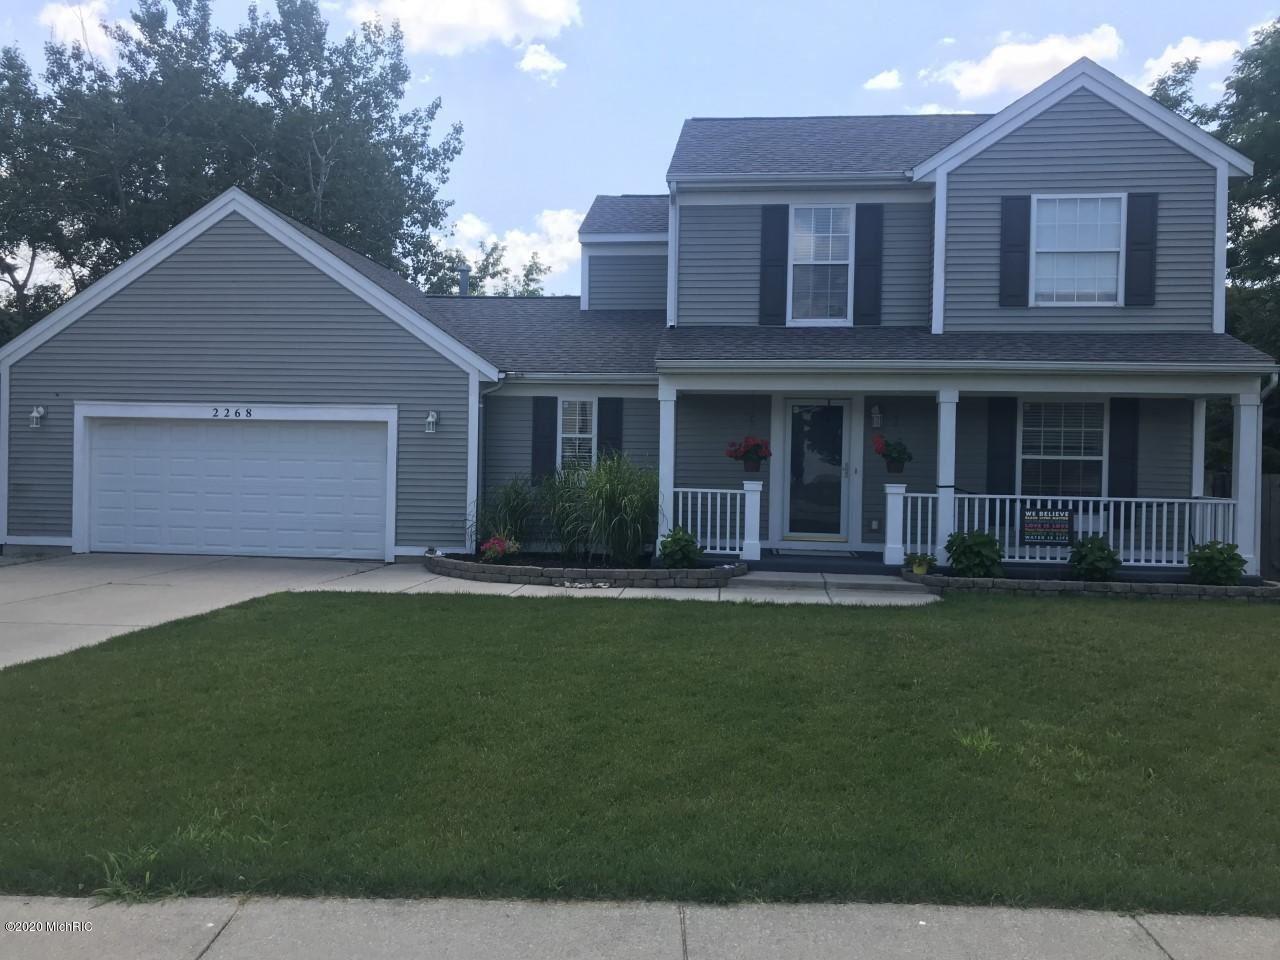 2268 Cedarcrest Drive NE, Grand Rapids, MI 49525 - MLS#: 20033953